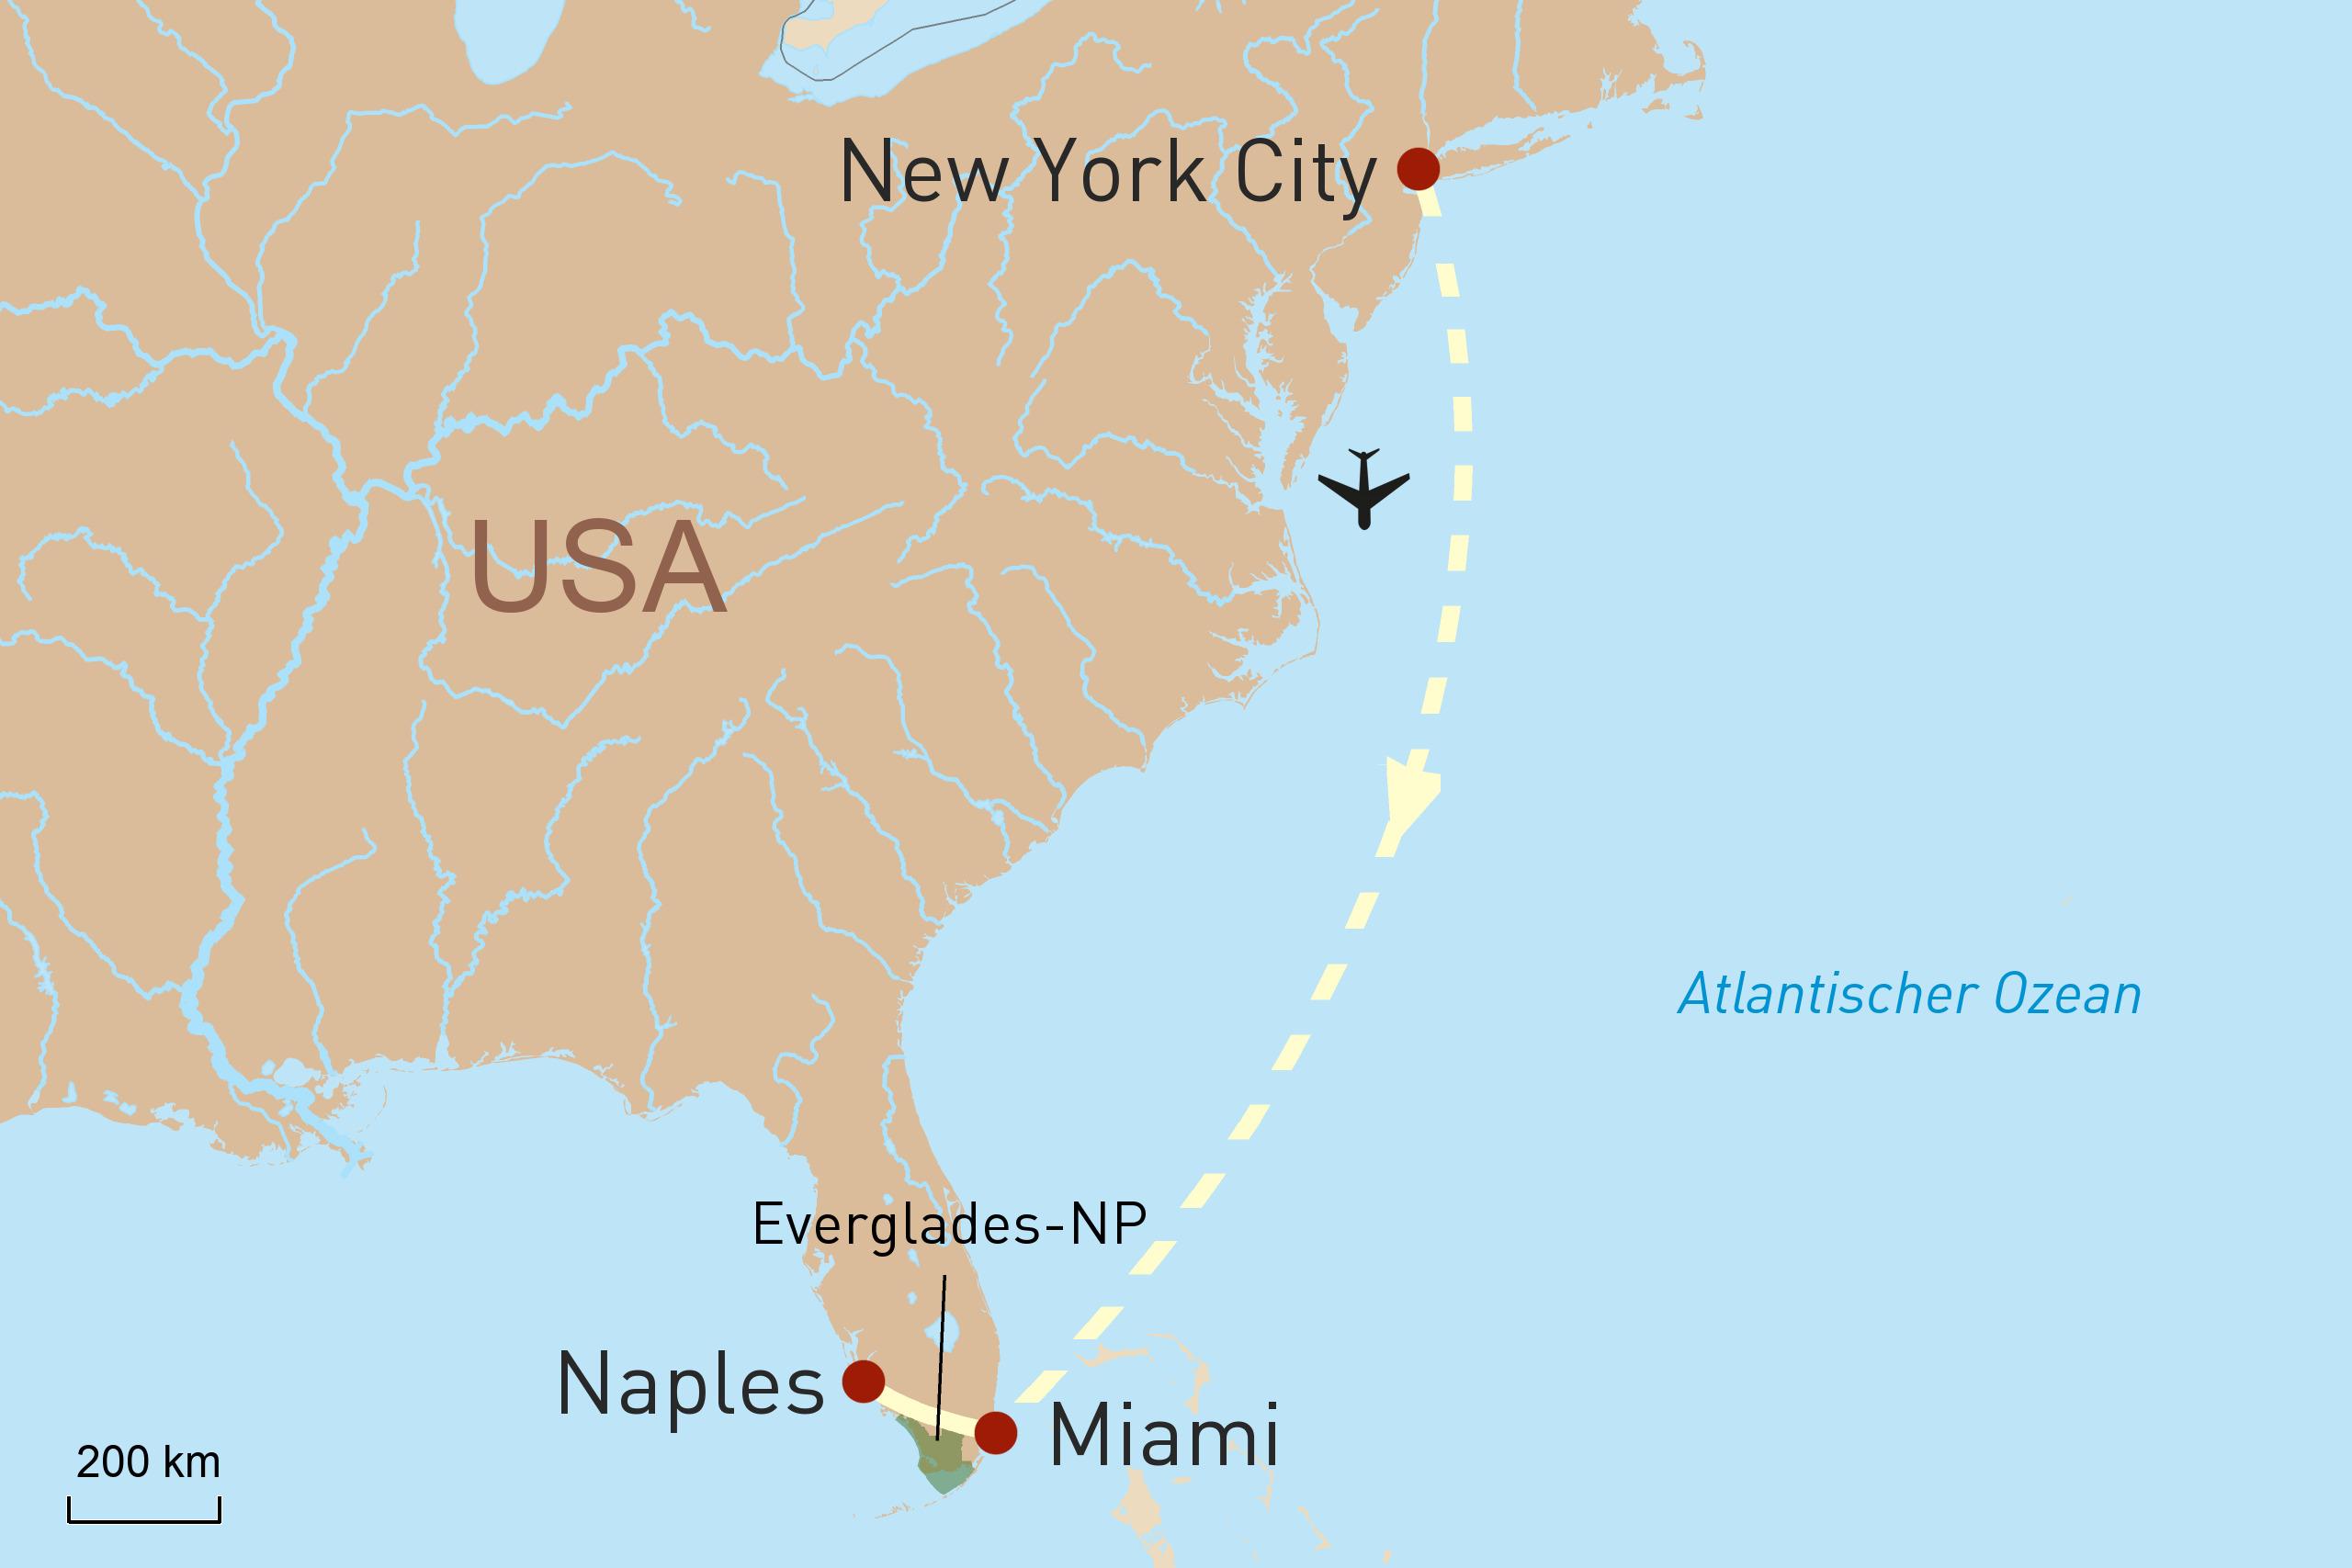 Metropolenerlebnis New York City und 'Sunshine-State' Florida